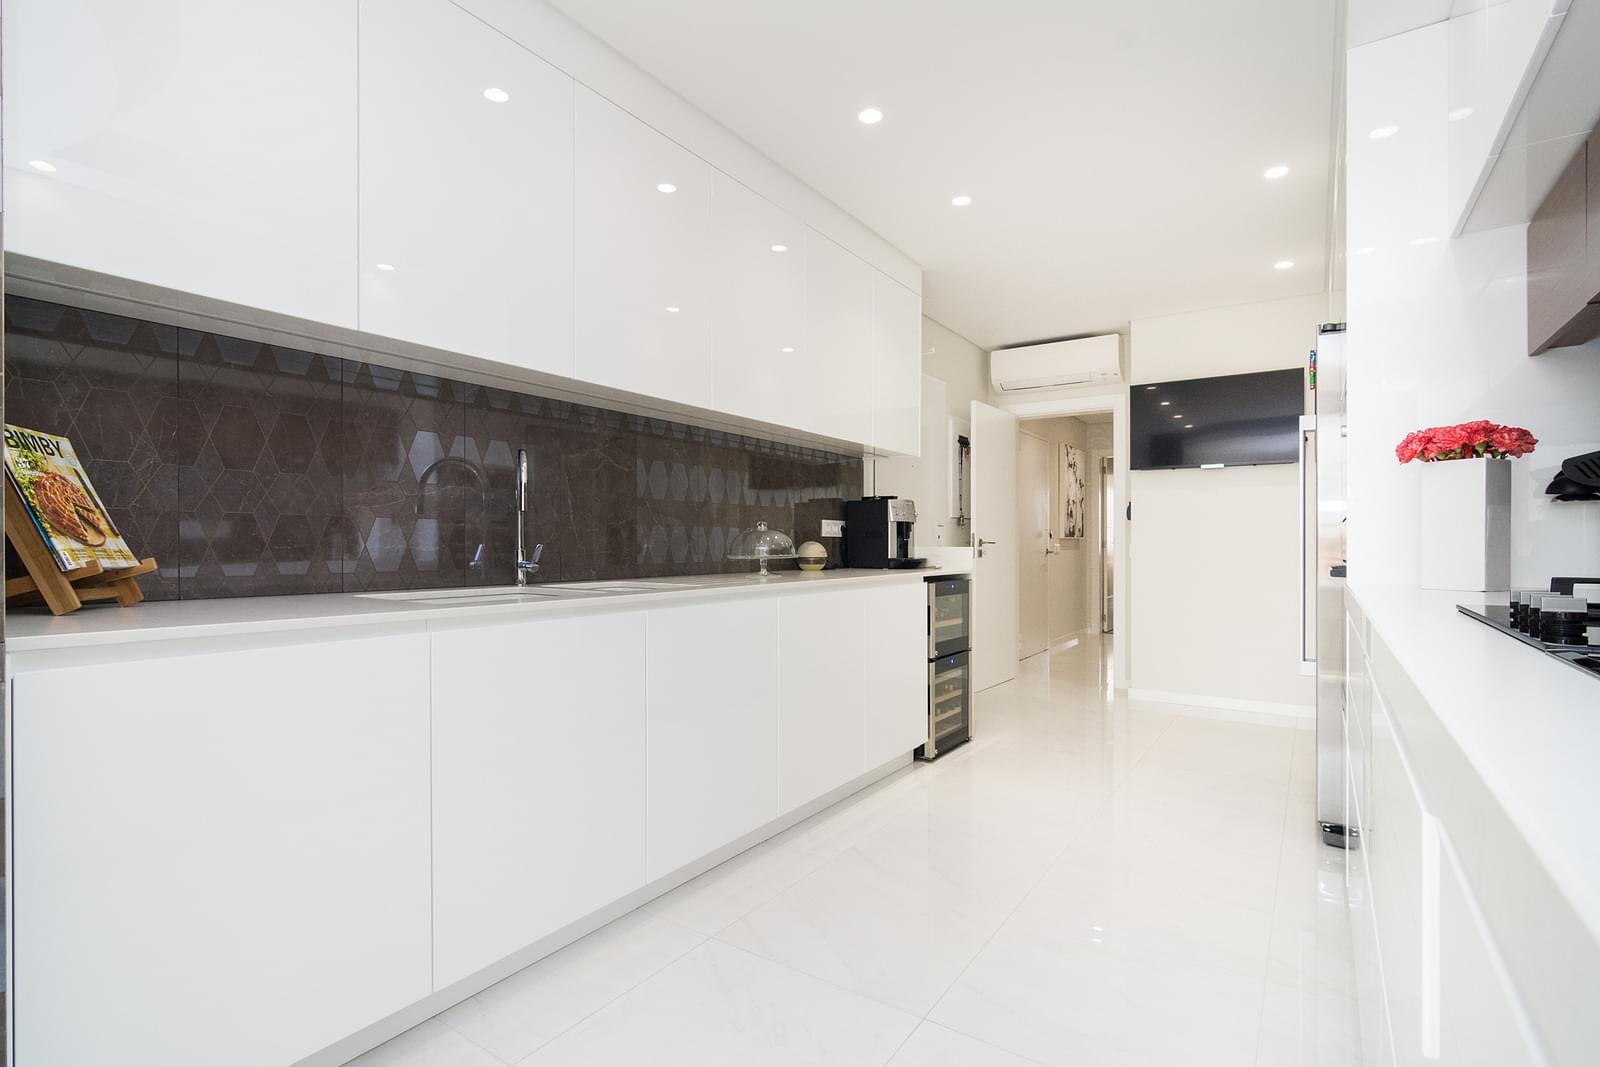 pf17479-apartamento-t4-lisboa-1c56e8f7-bed5-482e-ac48-7552a5e283f2